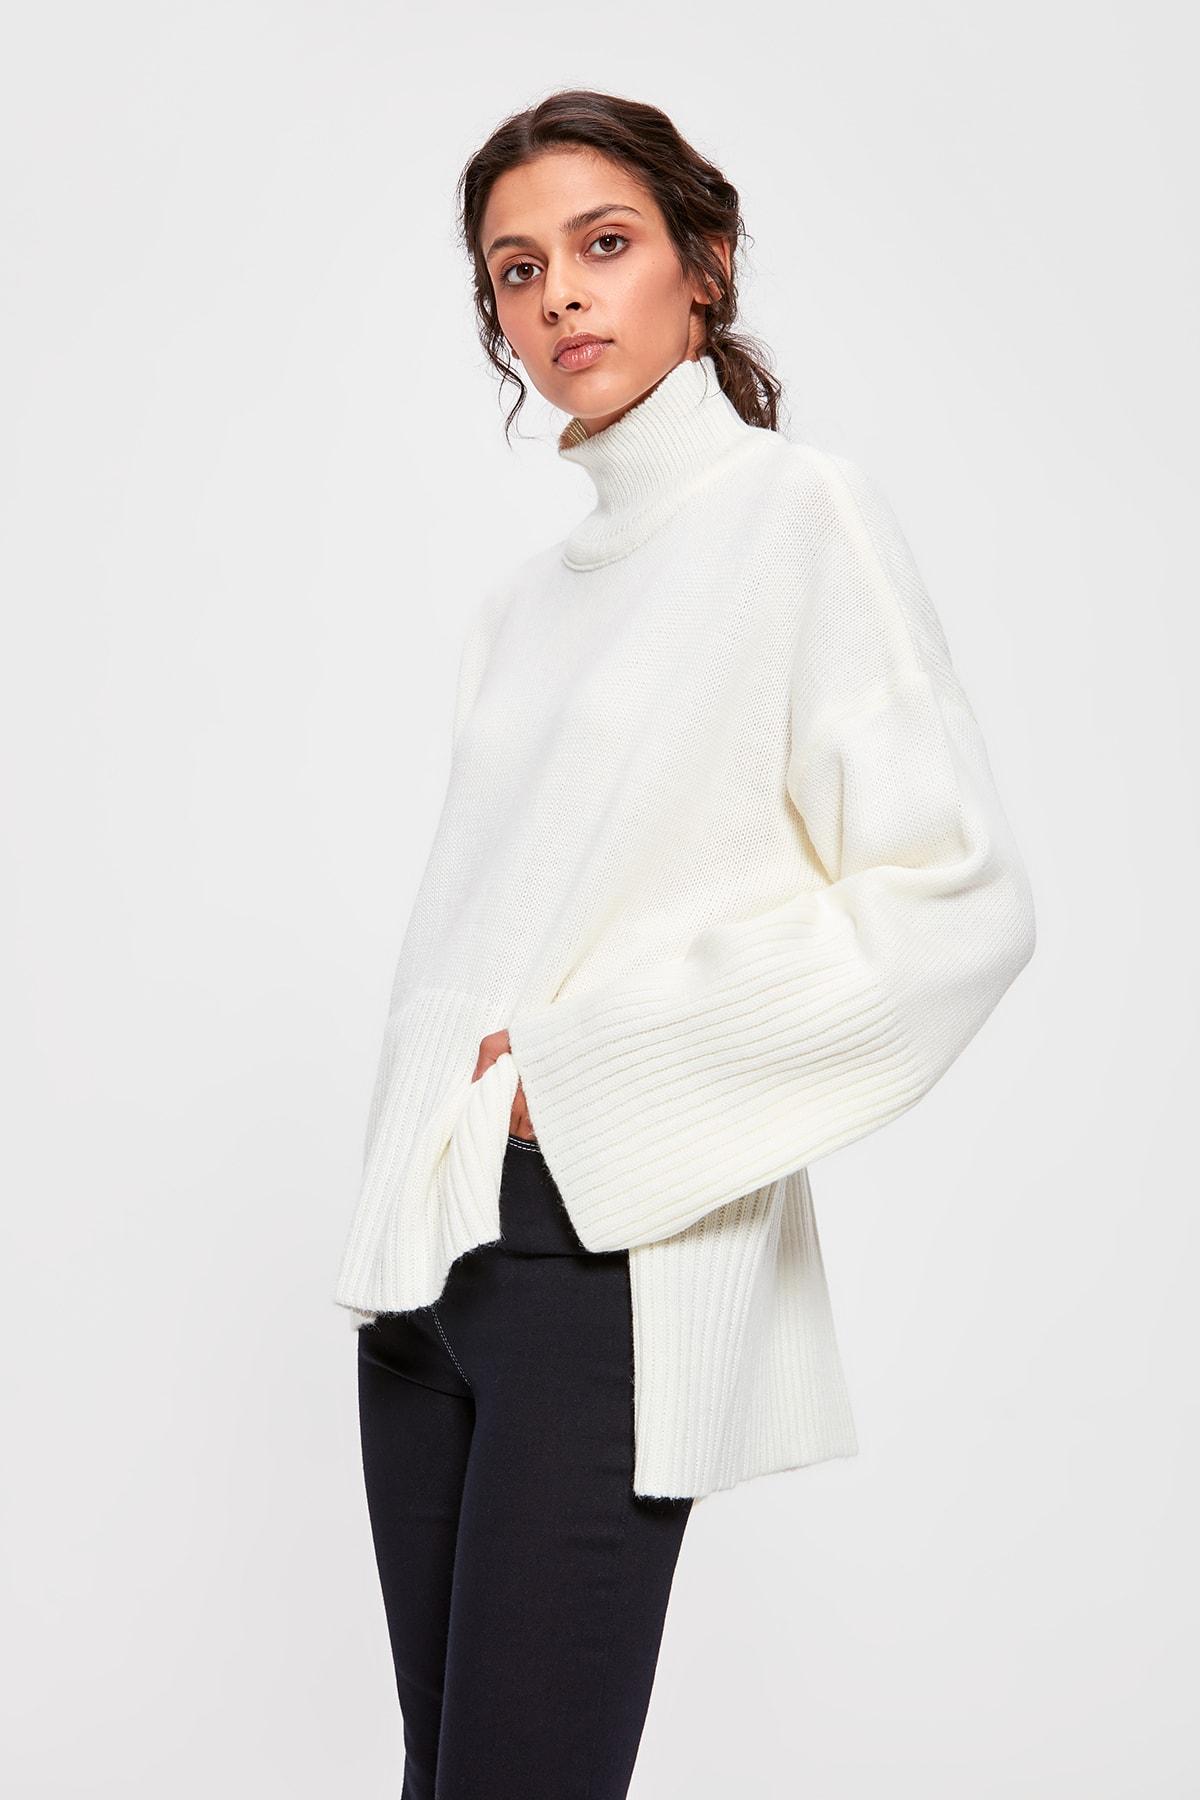 Trendyol Offwhite Upright Collar Sweater Sweater TWOAW20FV0089